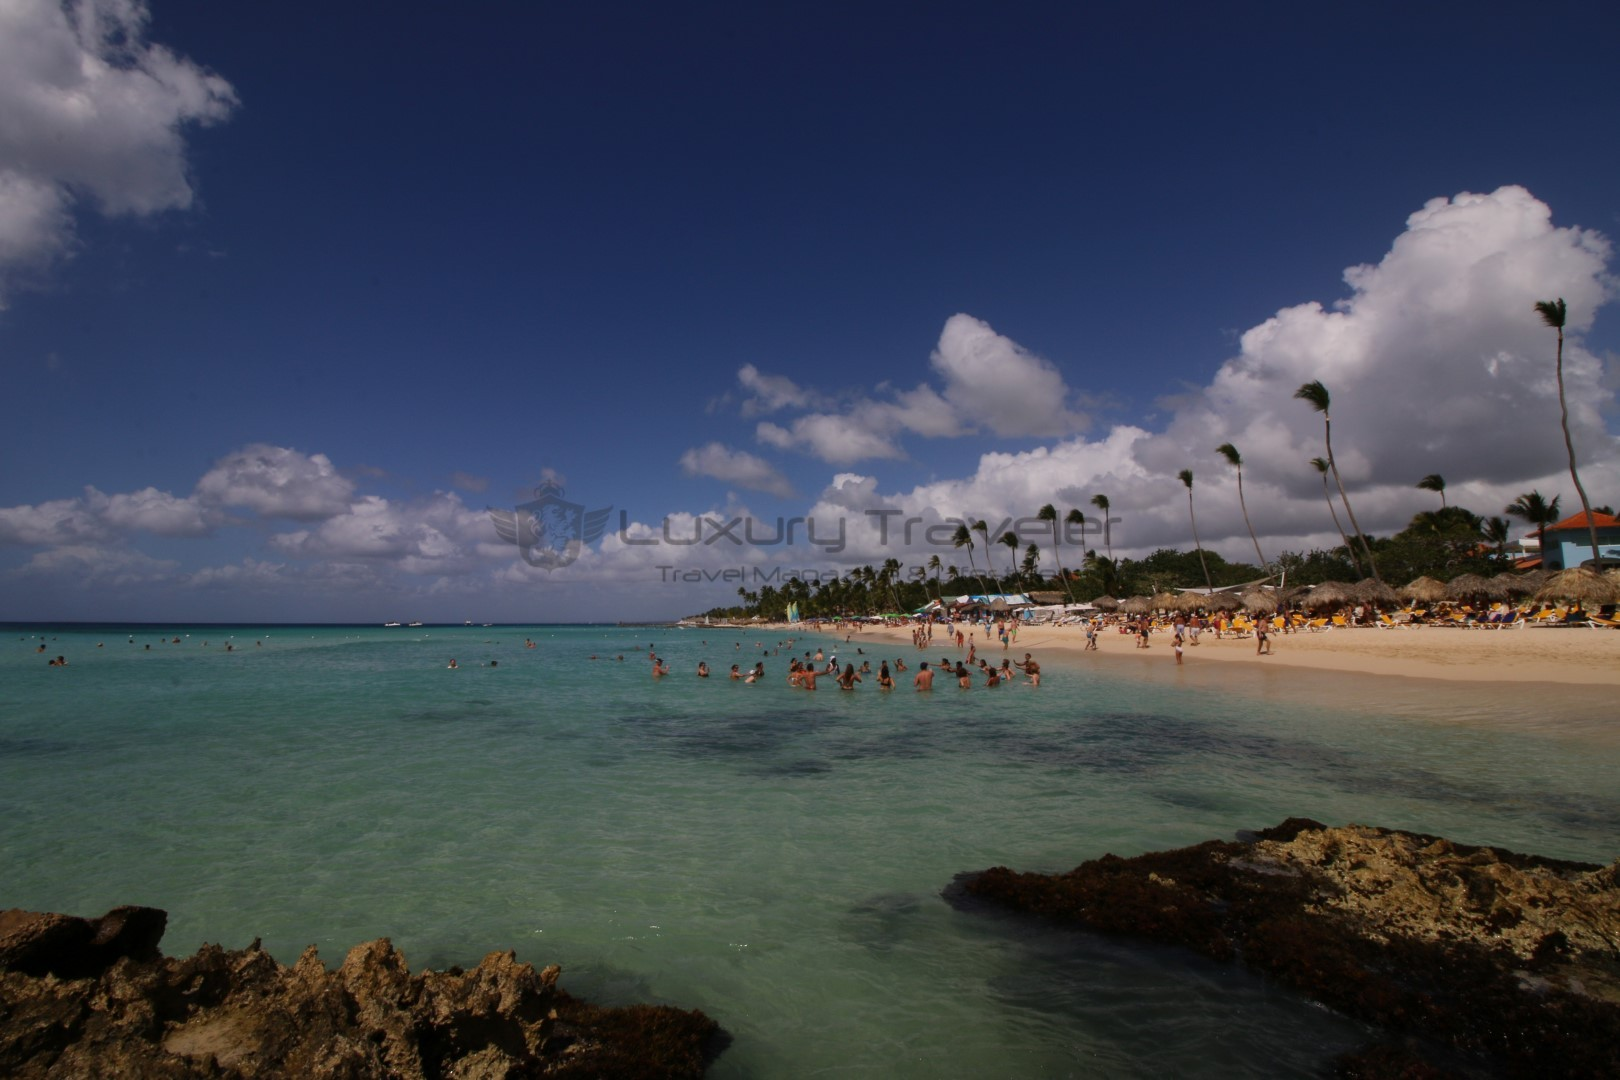 Iberostar_Hacienda_Dominicus_Republica_Dominicana_Hotel_Ocean_Beach